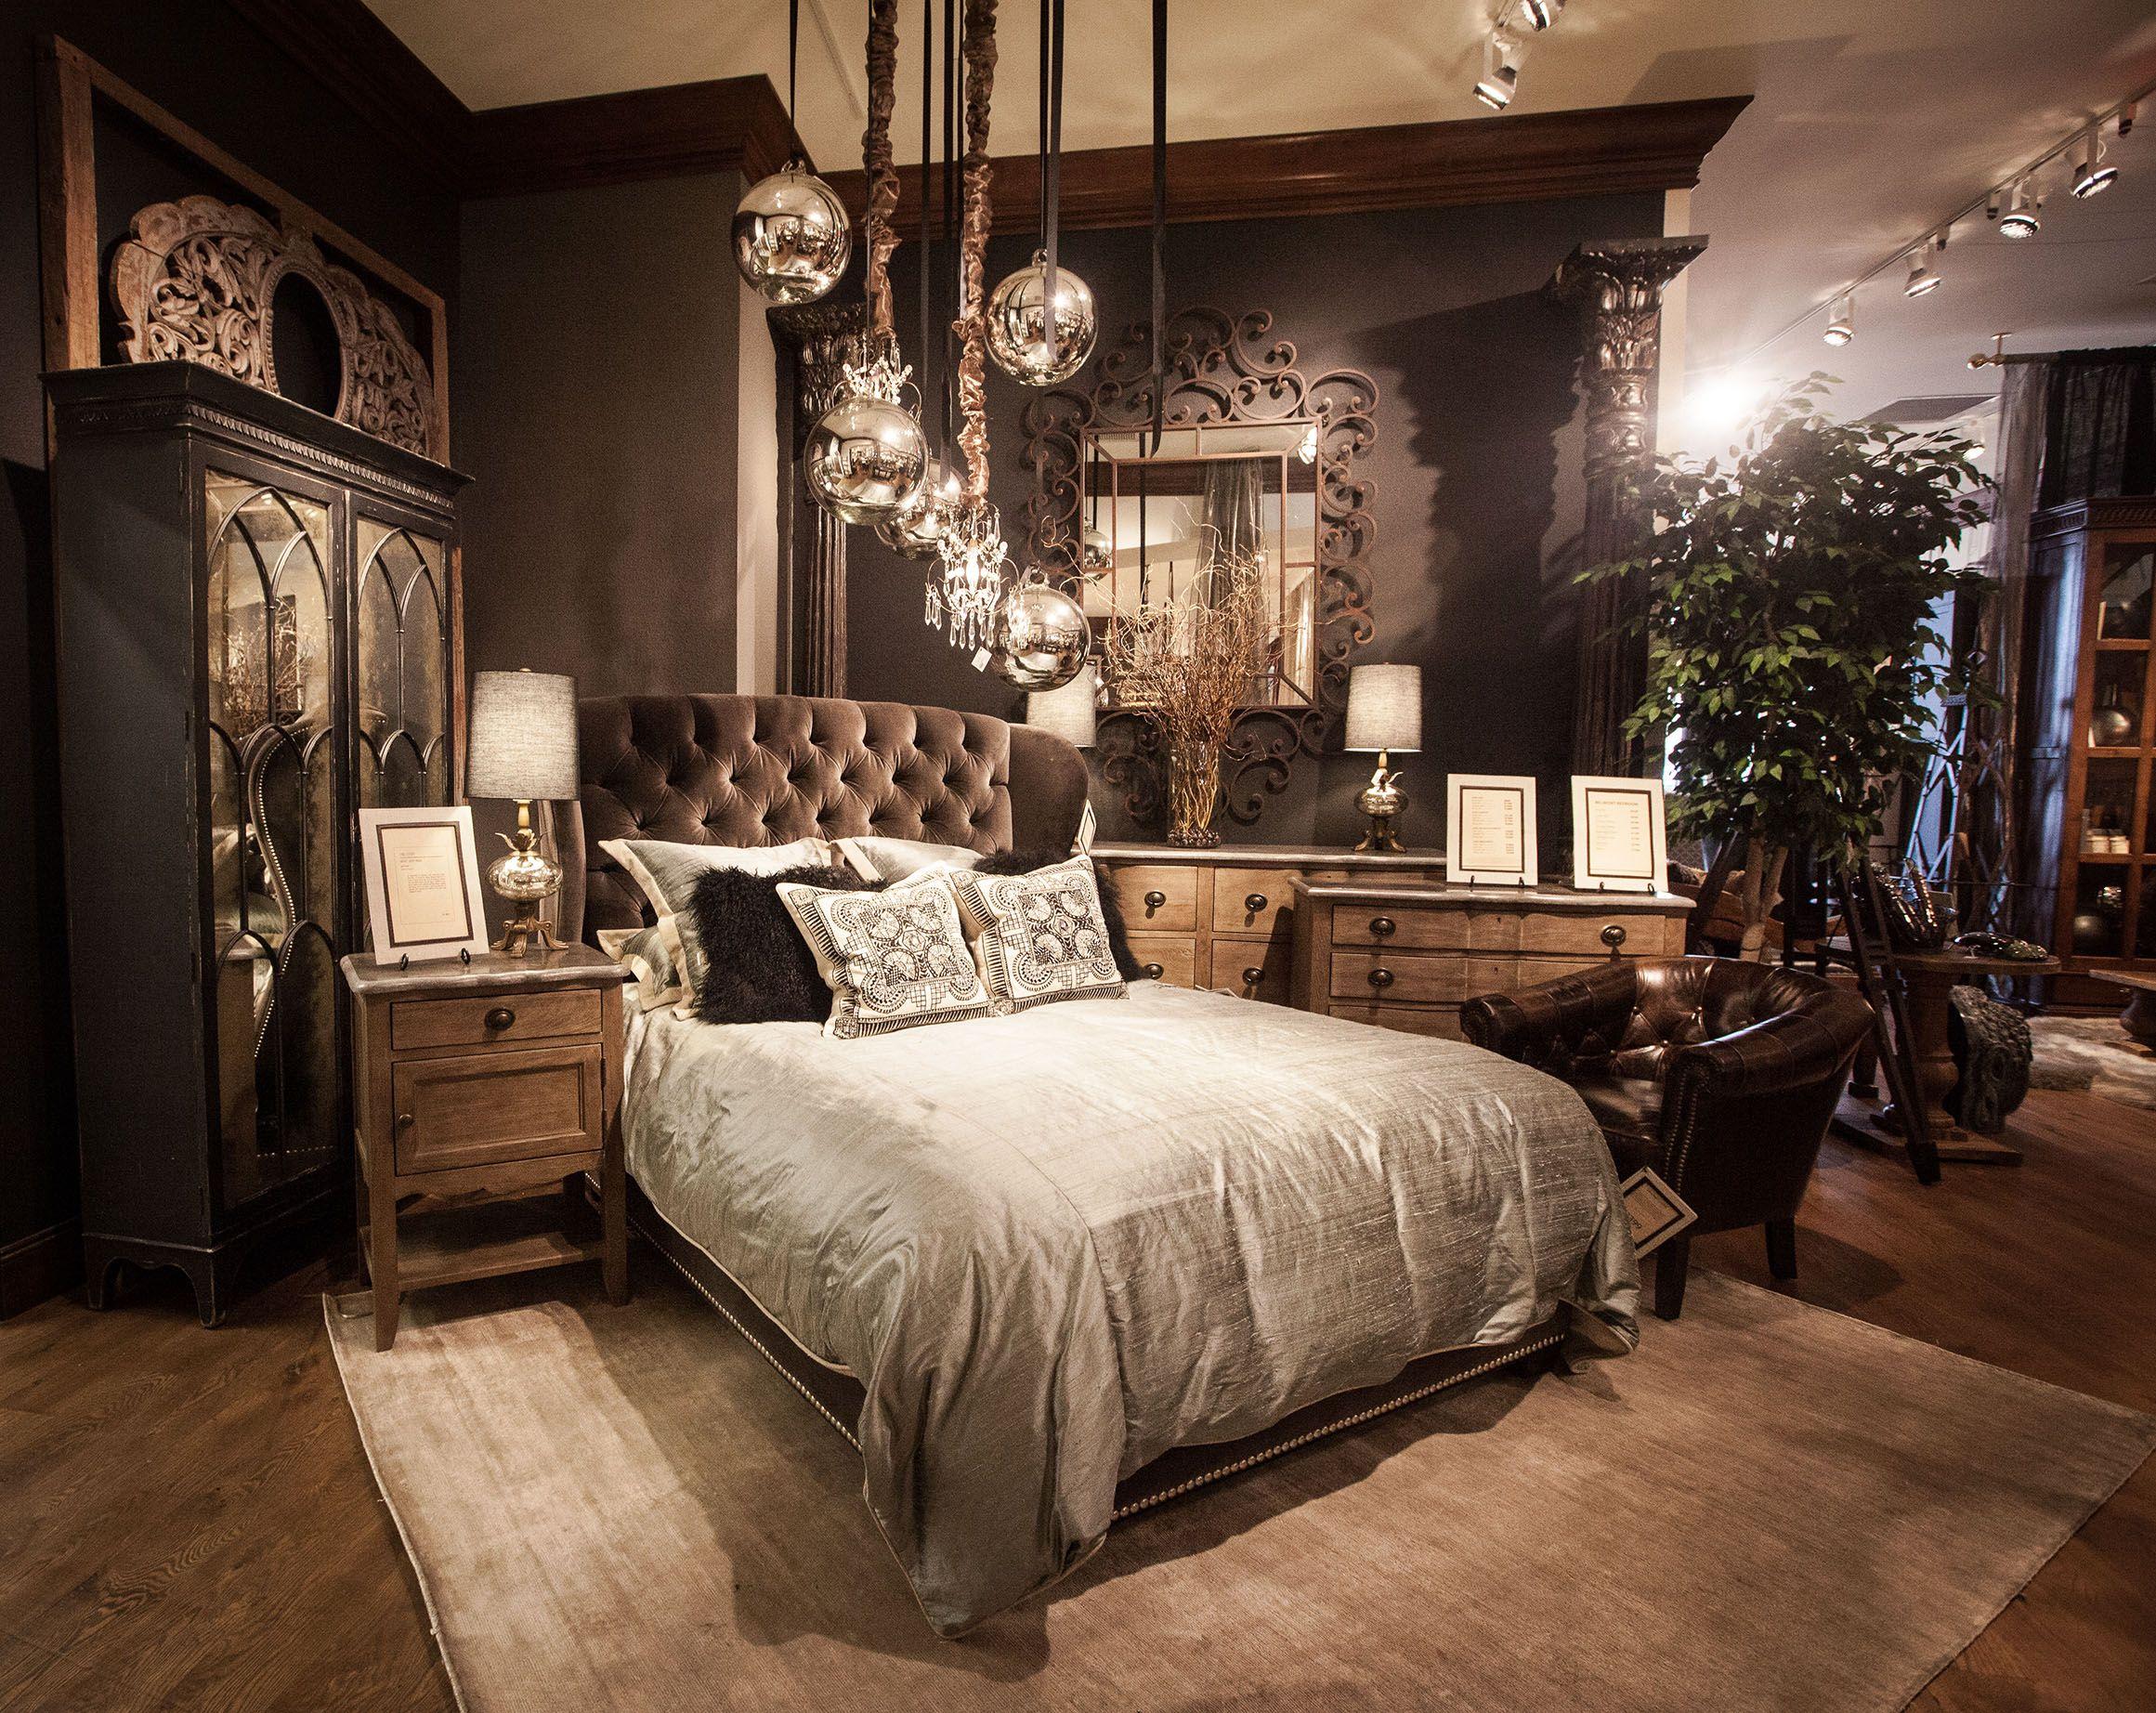 Found My New Bedroom Furniture In Cincinnati Finally